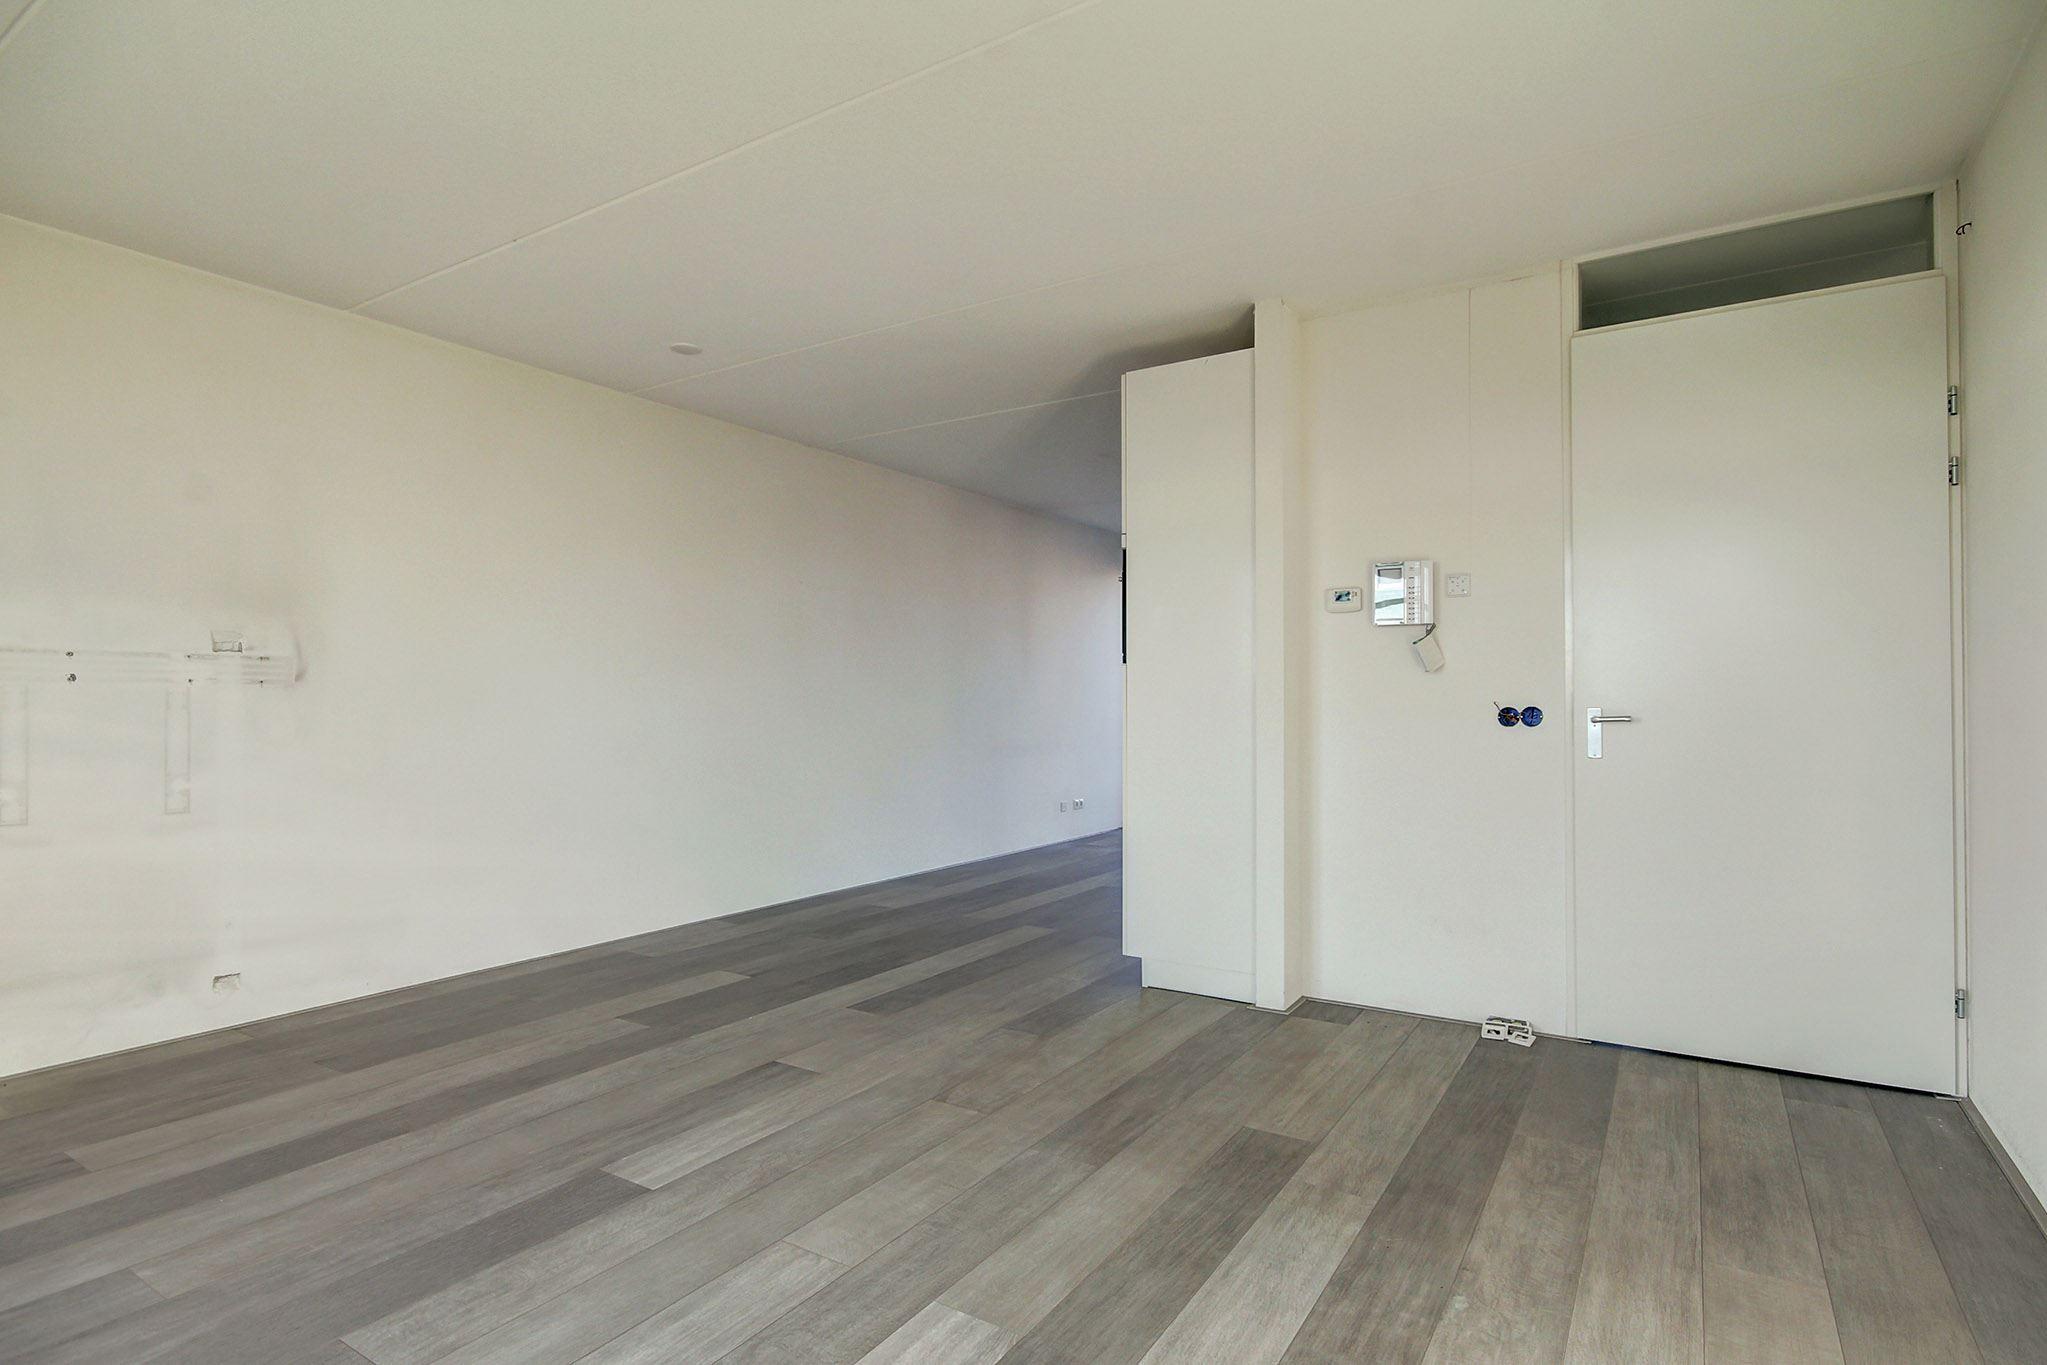 Verkocht artemissingel 229 1363 tg almere funda - Foto moderne inbouwkeuken ...